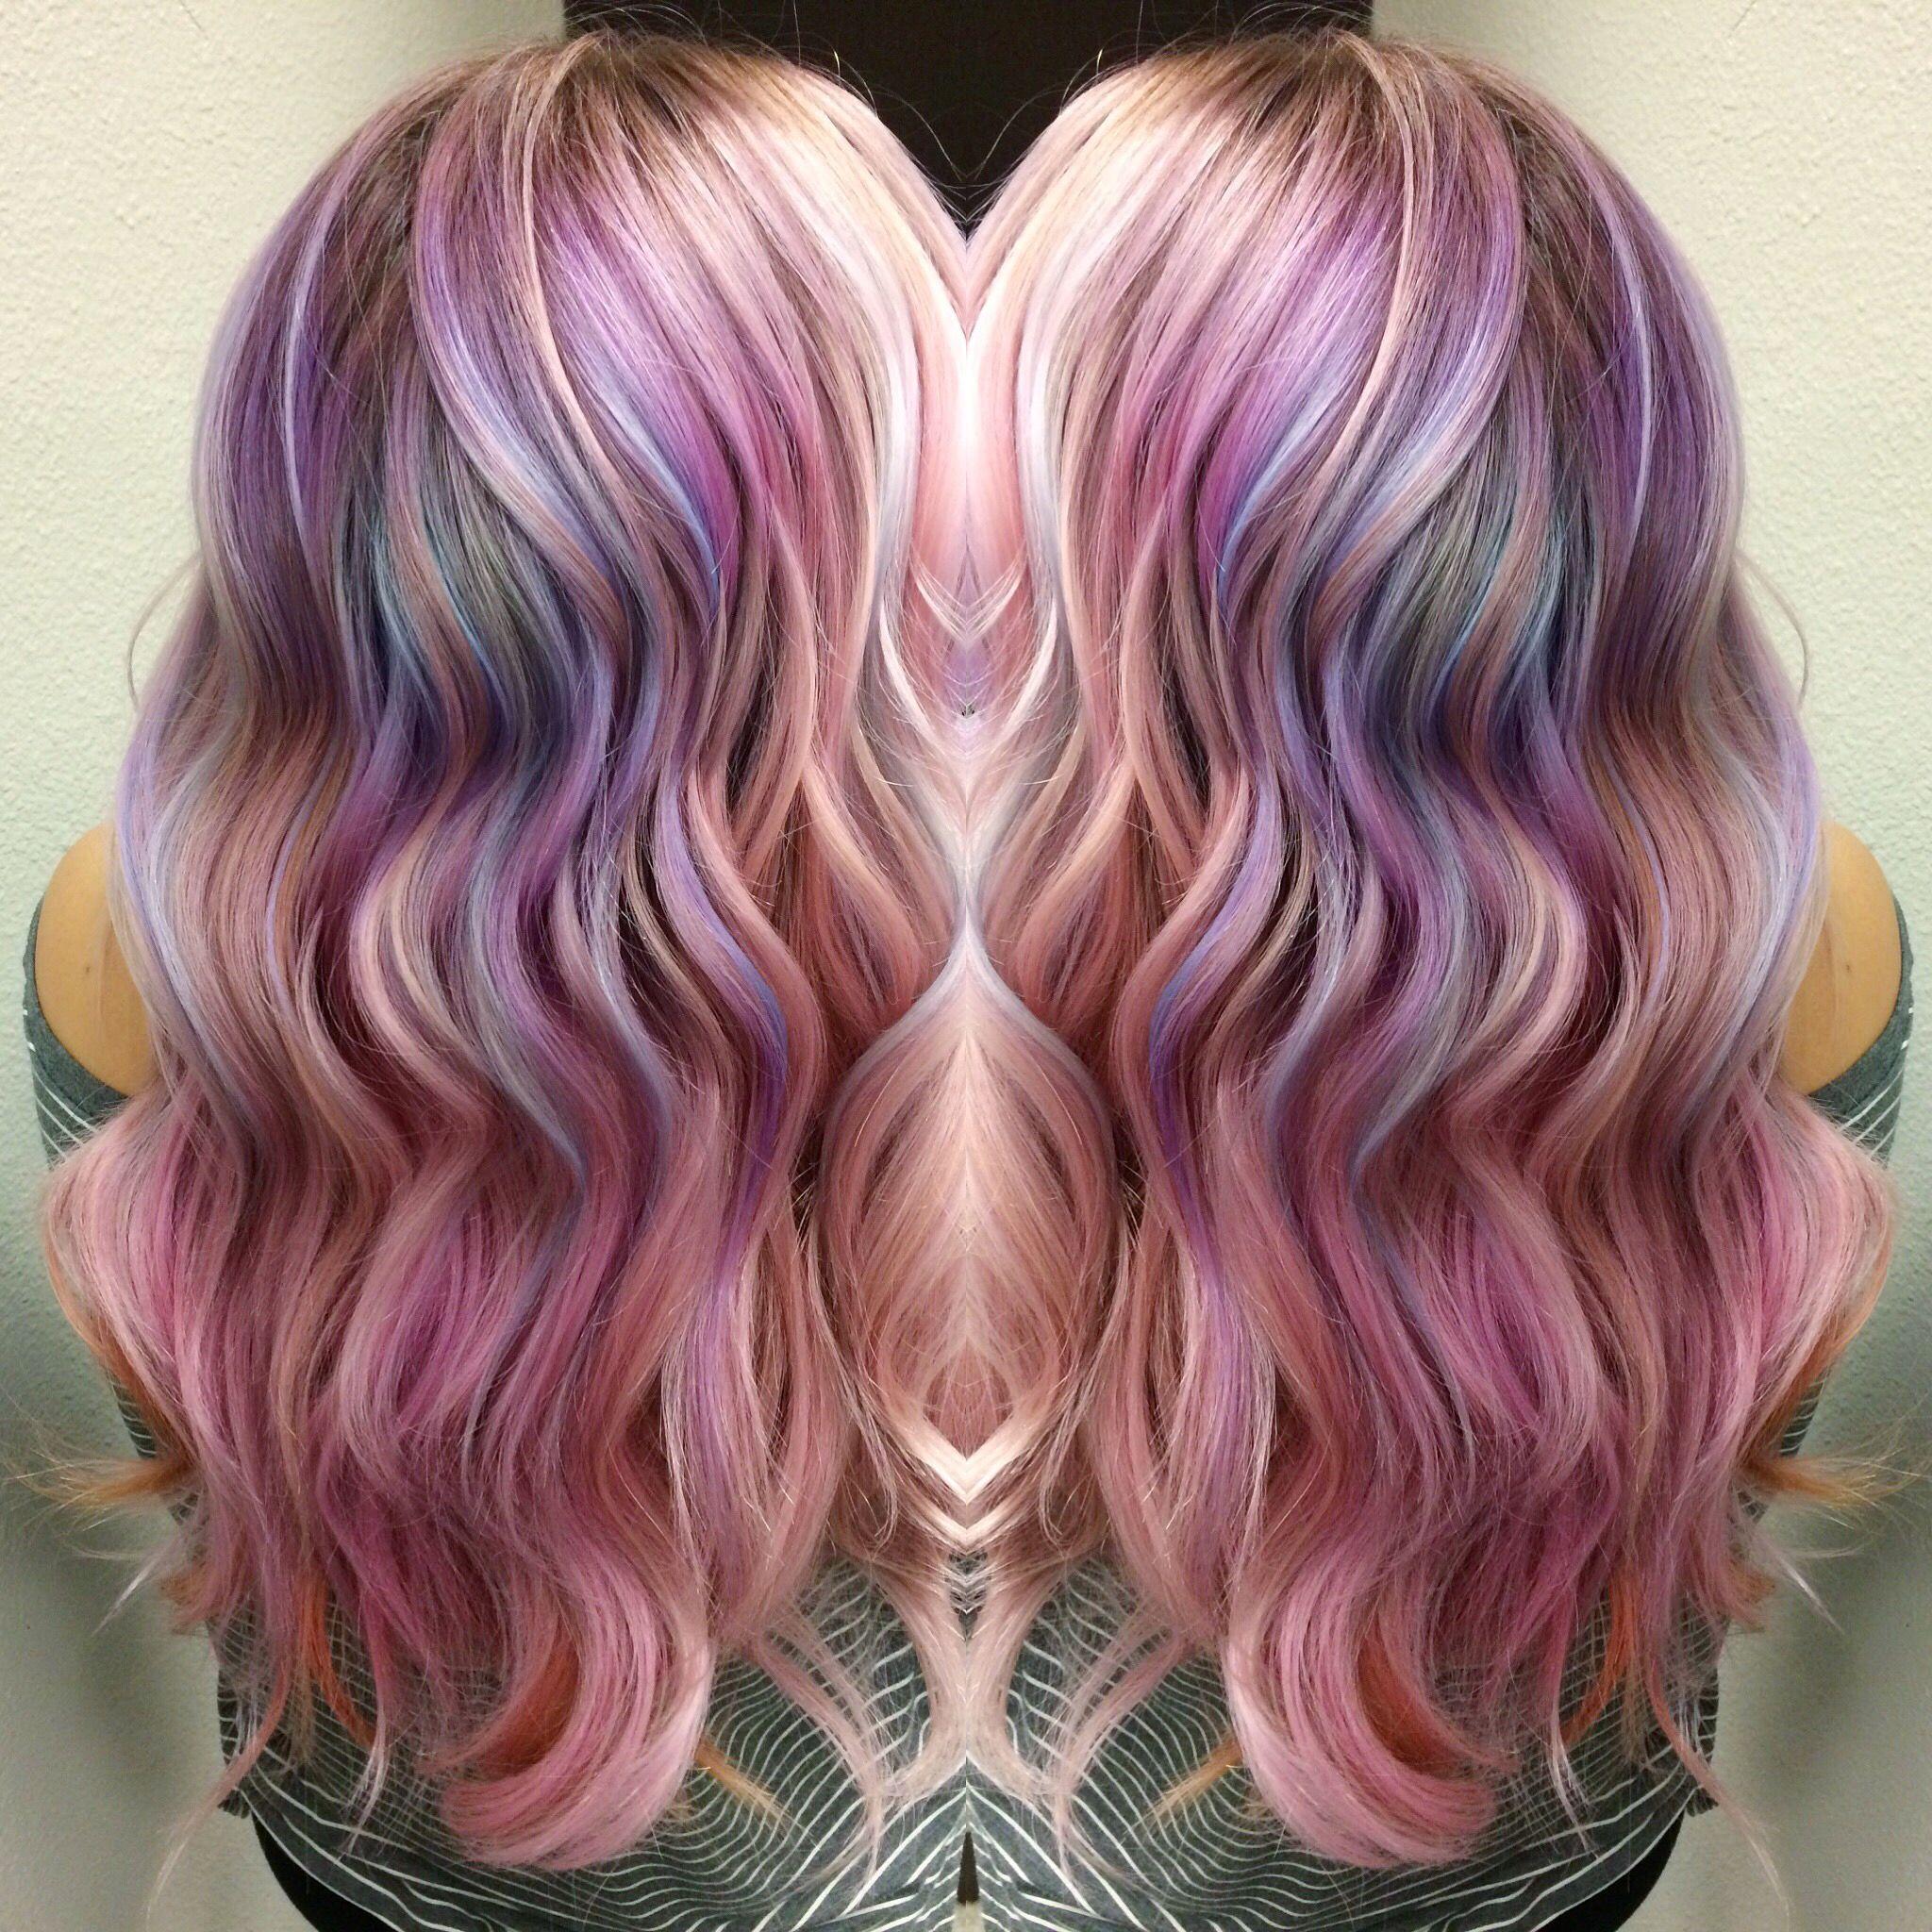 Hair Style Hair Color Rainbow Hair Mermaid Hair Whimsical Brandi Pretty Hair Color Hair Color Pastel Cool Hair Color